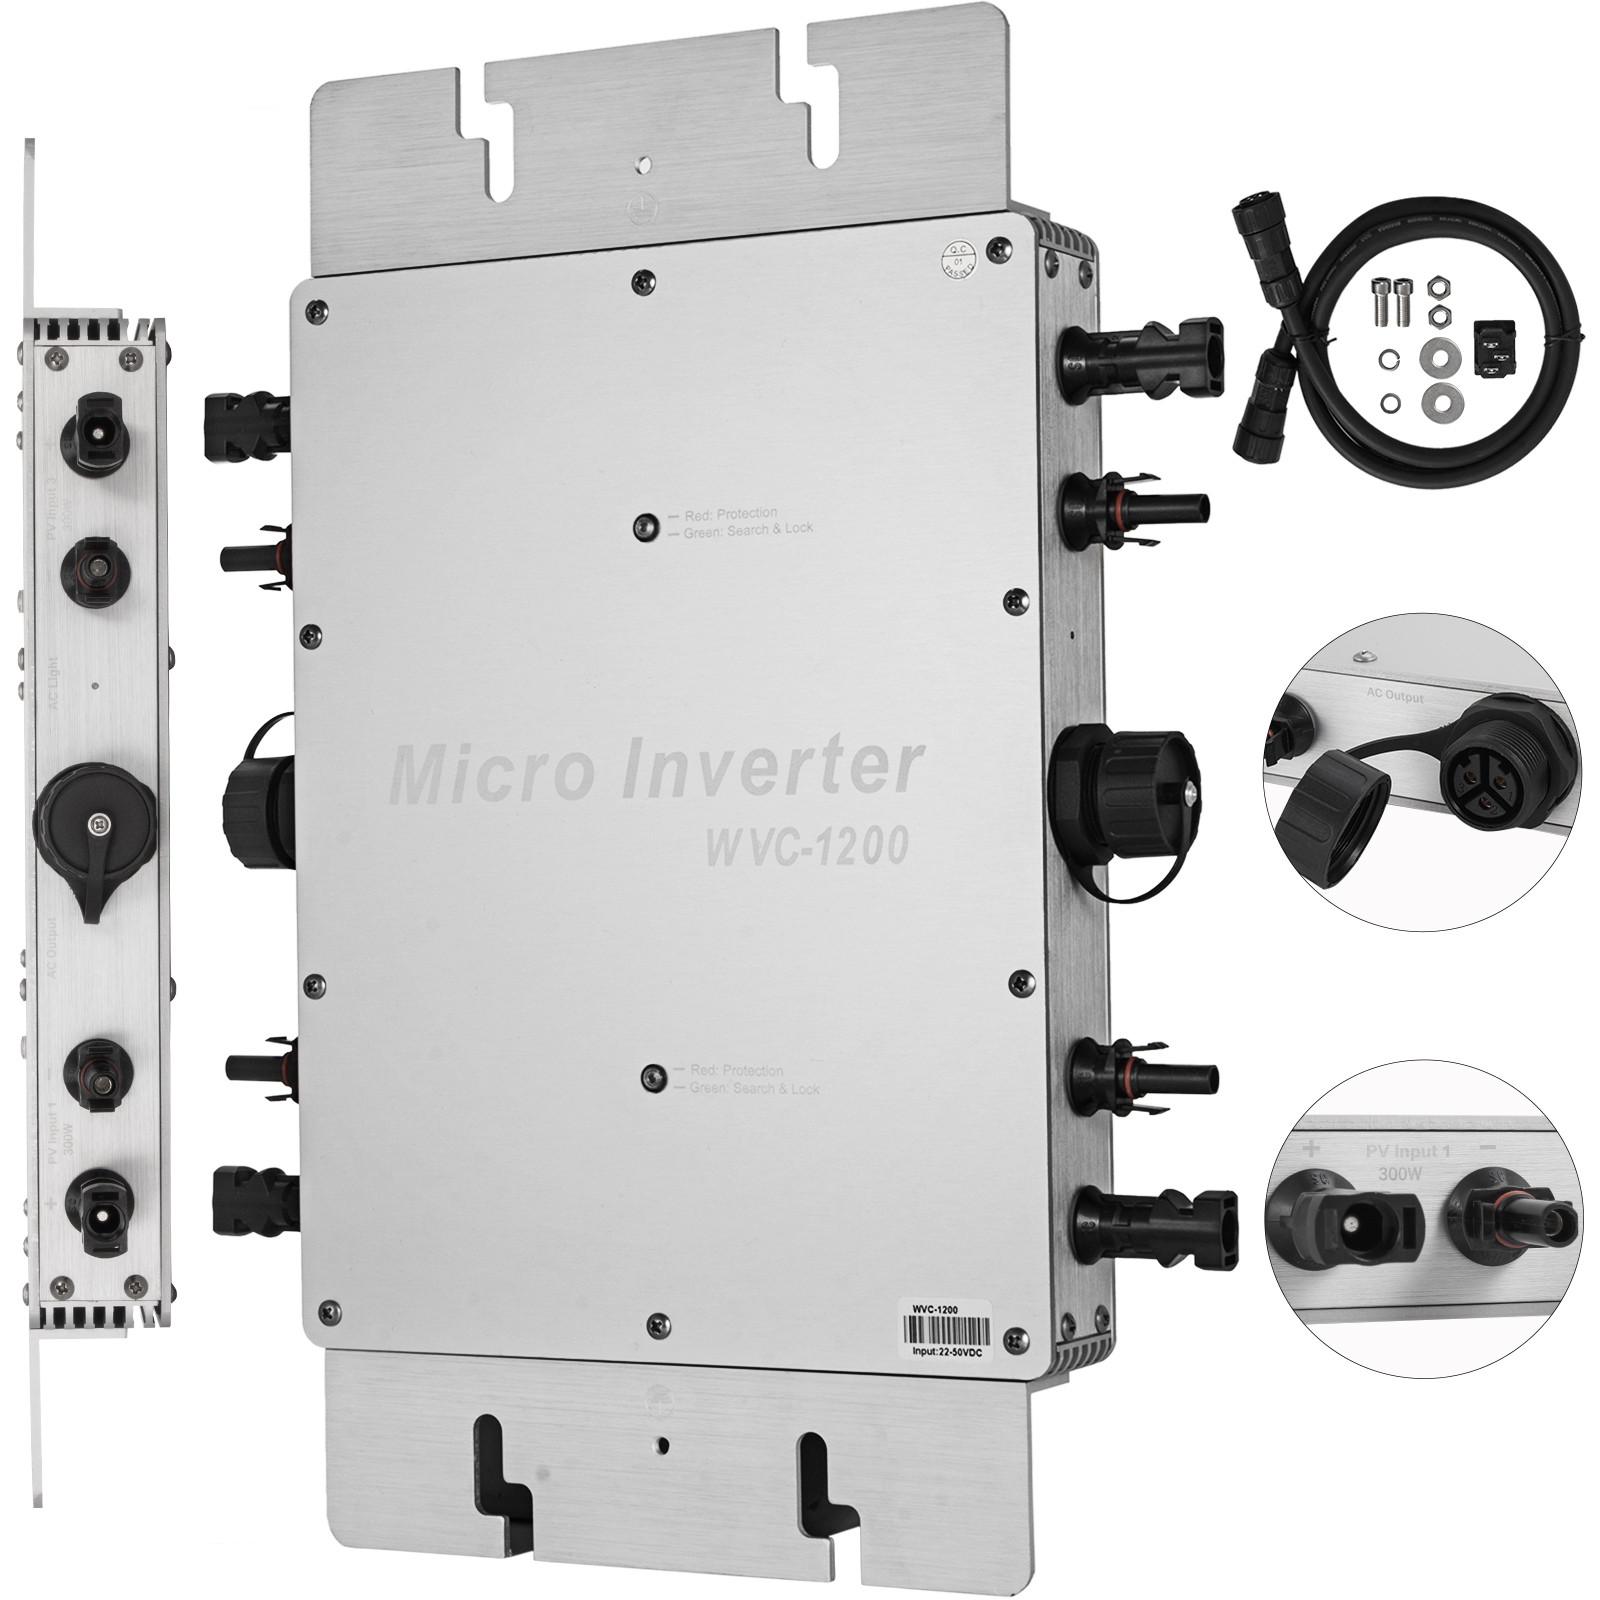 WVC-300W-600W-1200W-110V-220V-MPPT-Solar-Grid-Tie-Micro-Inverter-Waterproof-IP65 thumbnail 60